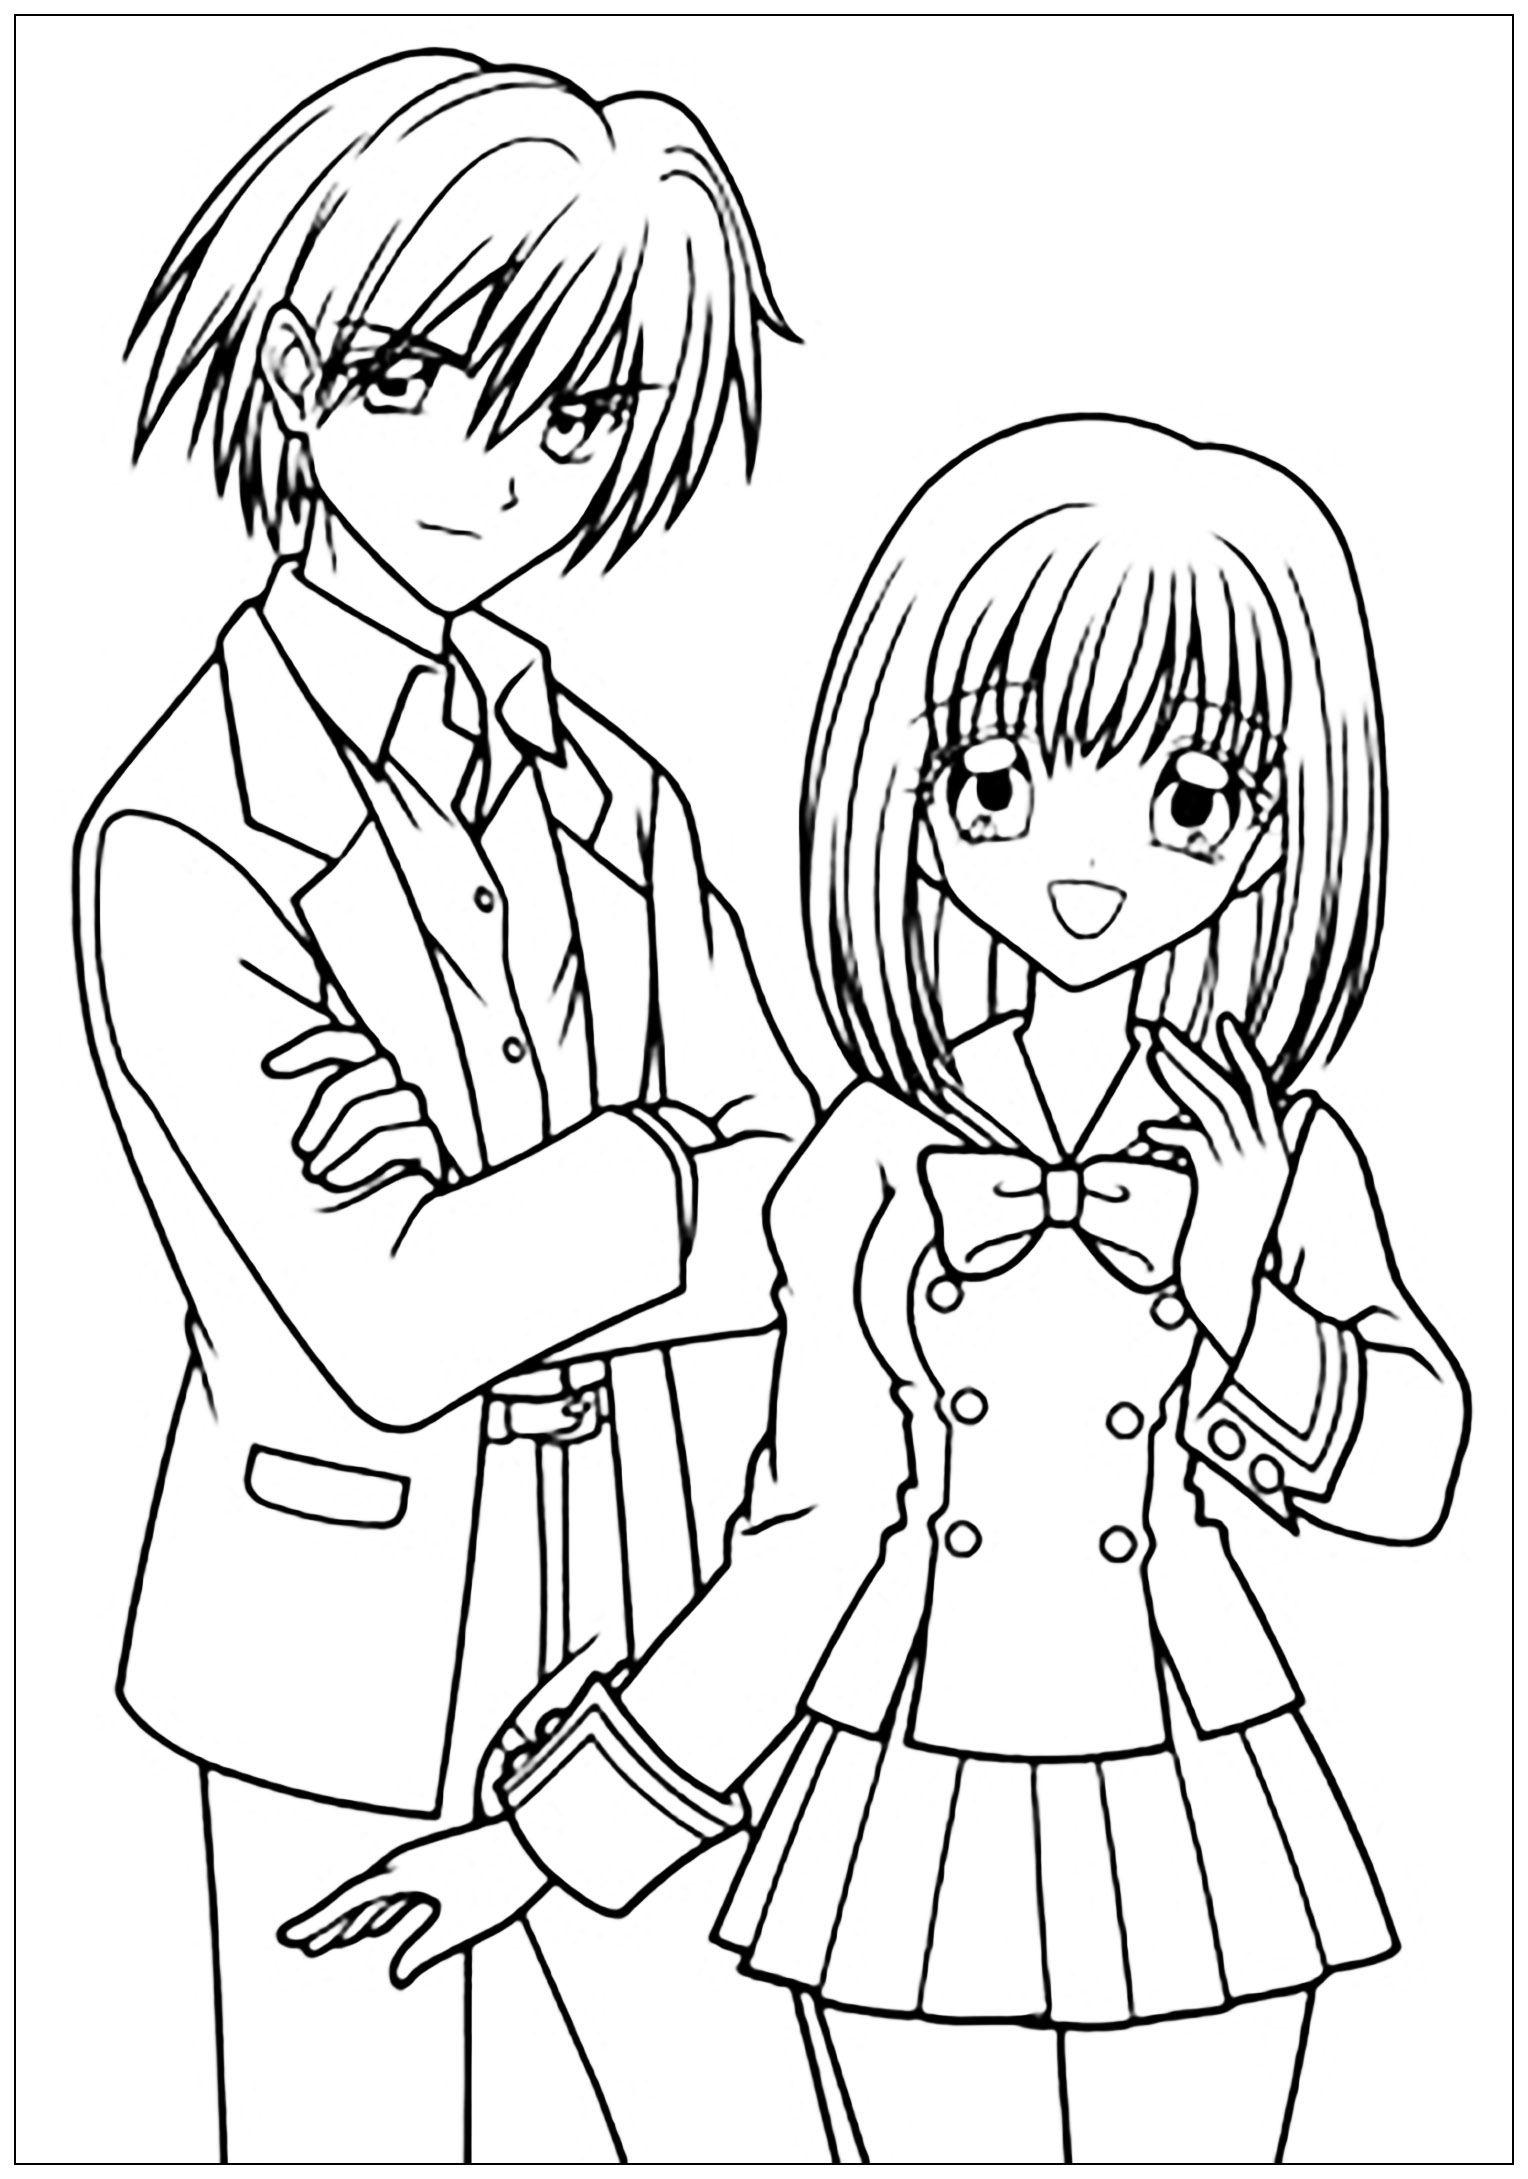 Manga drawing schoolchildren in uniformFrom the gallery